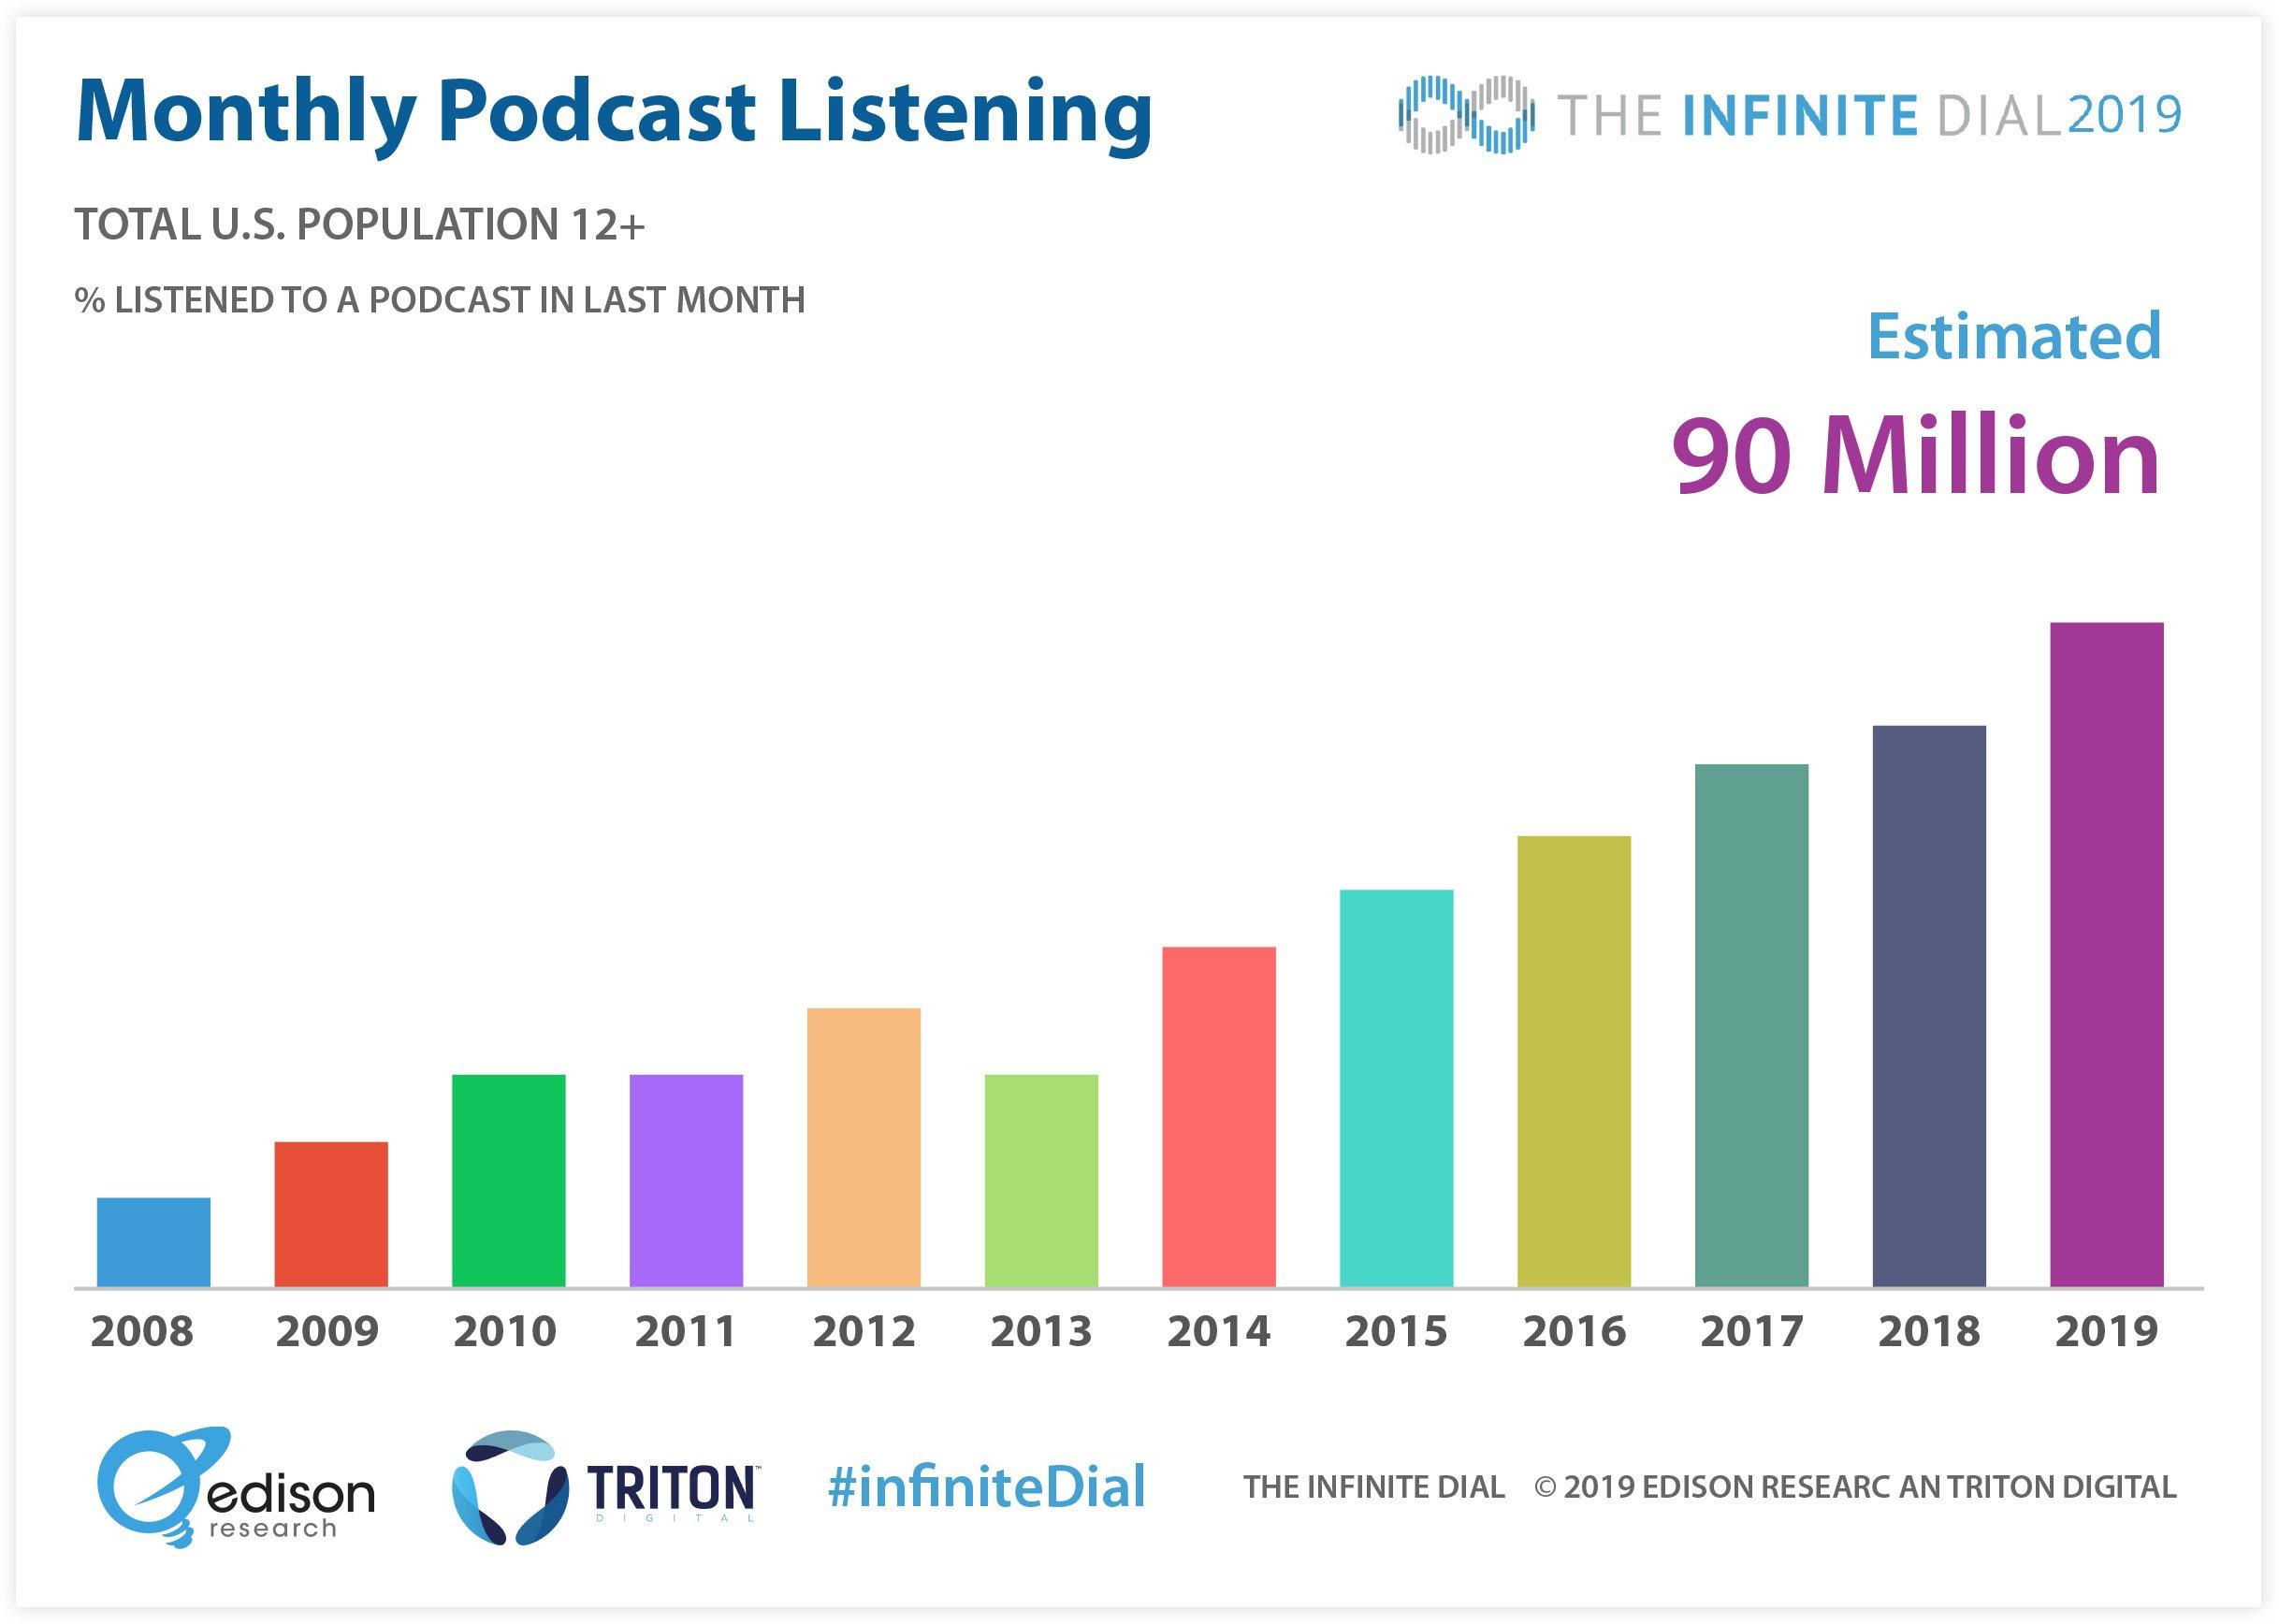 The Podcast Consumer Listener Statistics